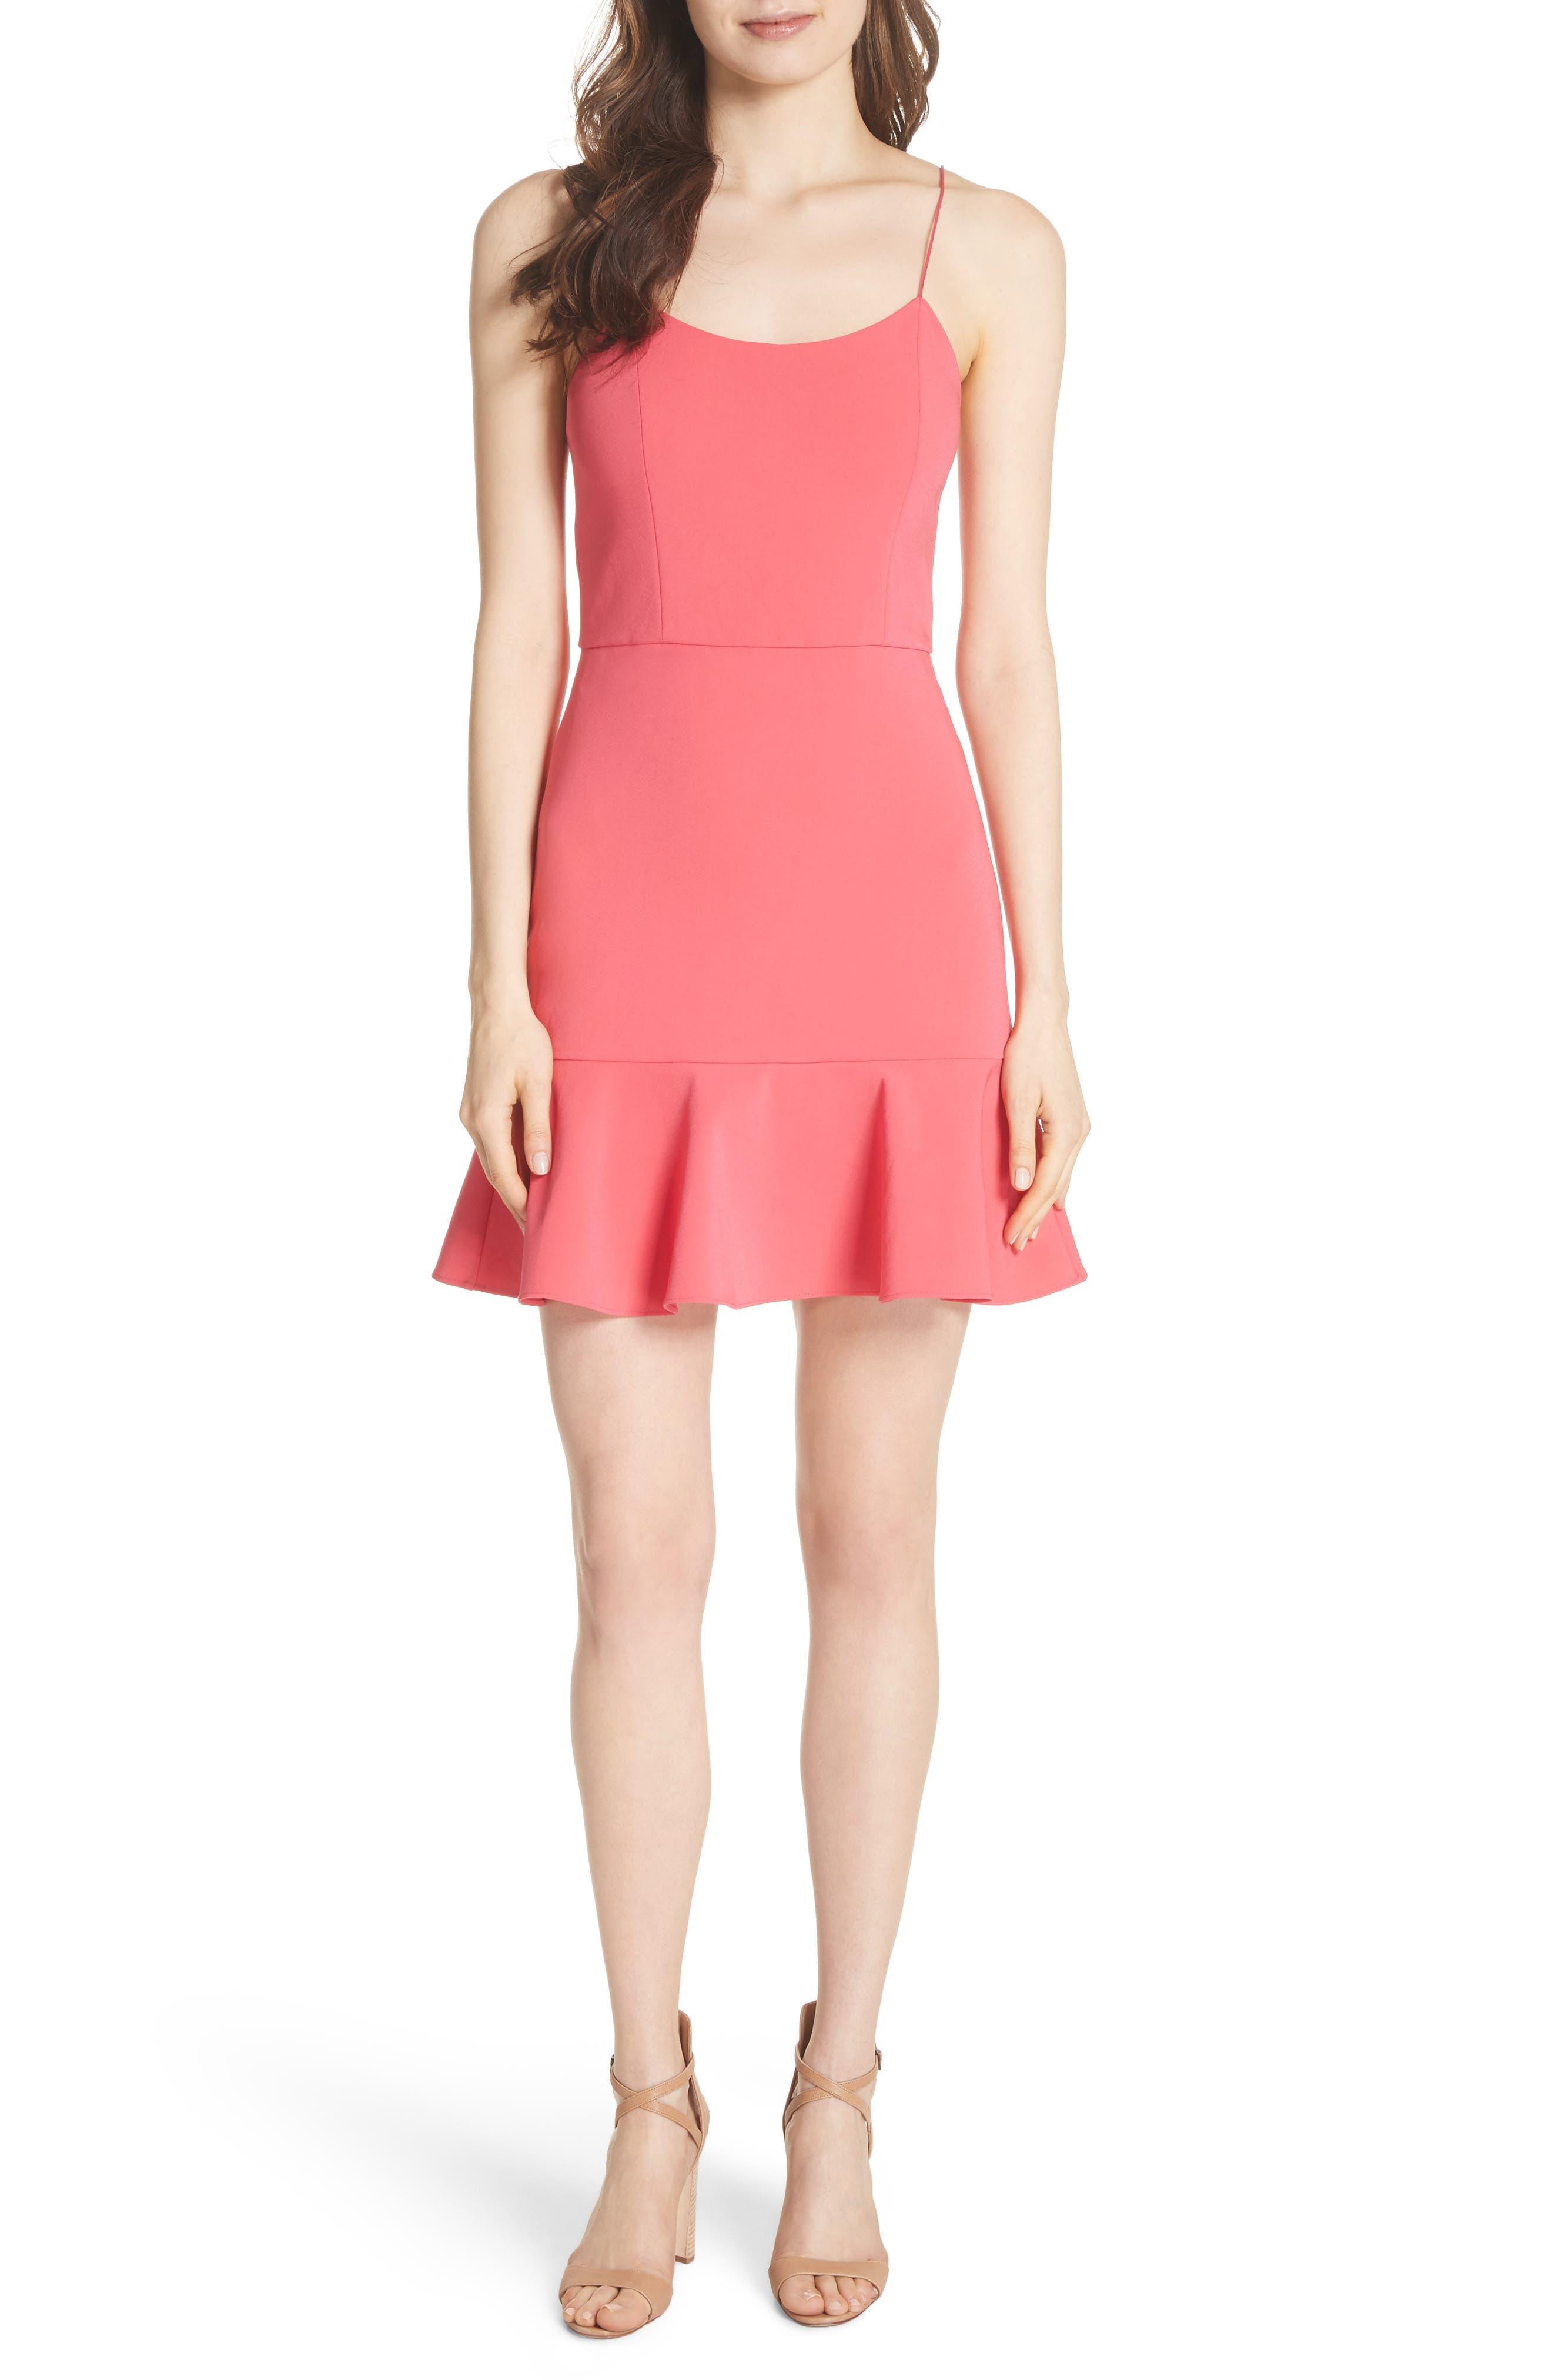 Alice + Olivia Andalasia Sleeveless Fit & Flare Dress